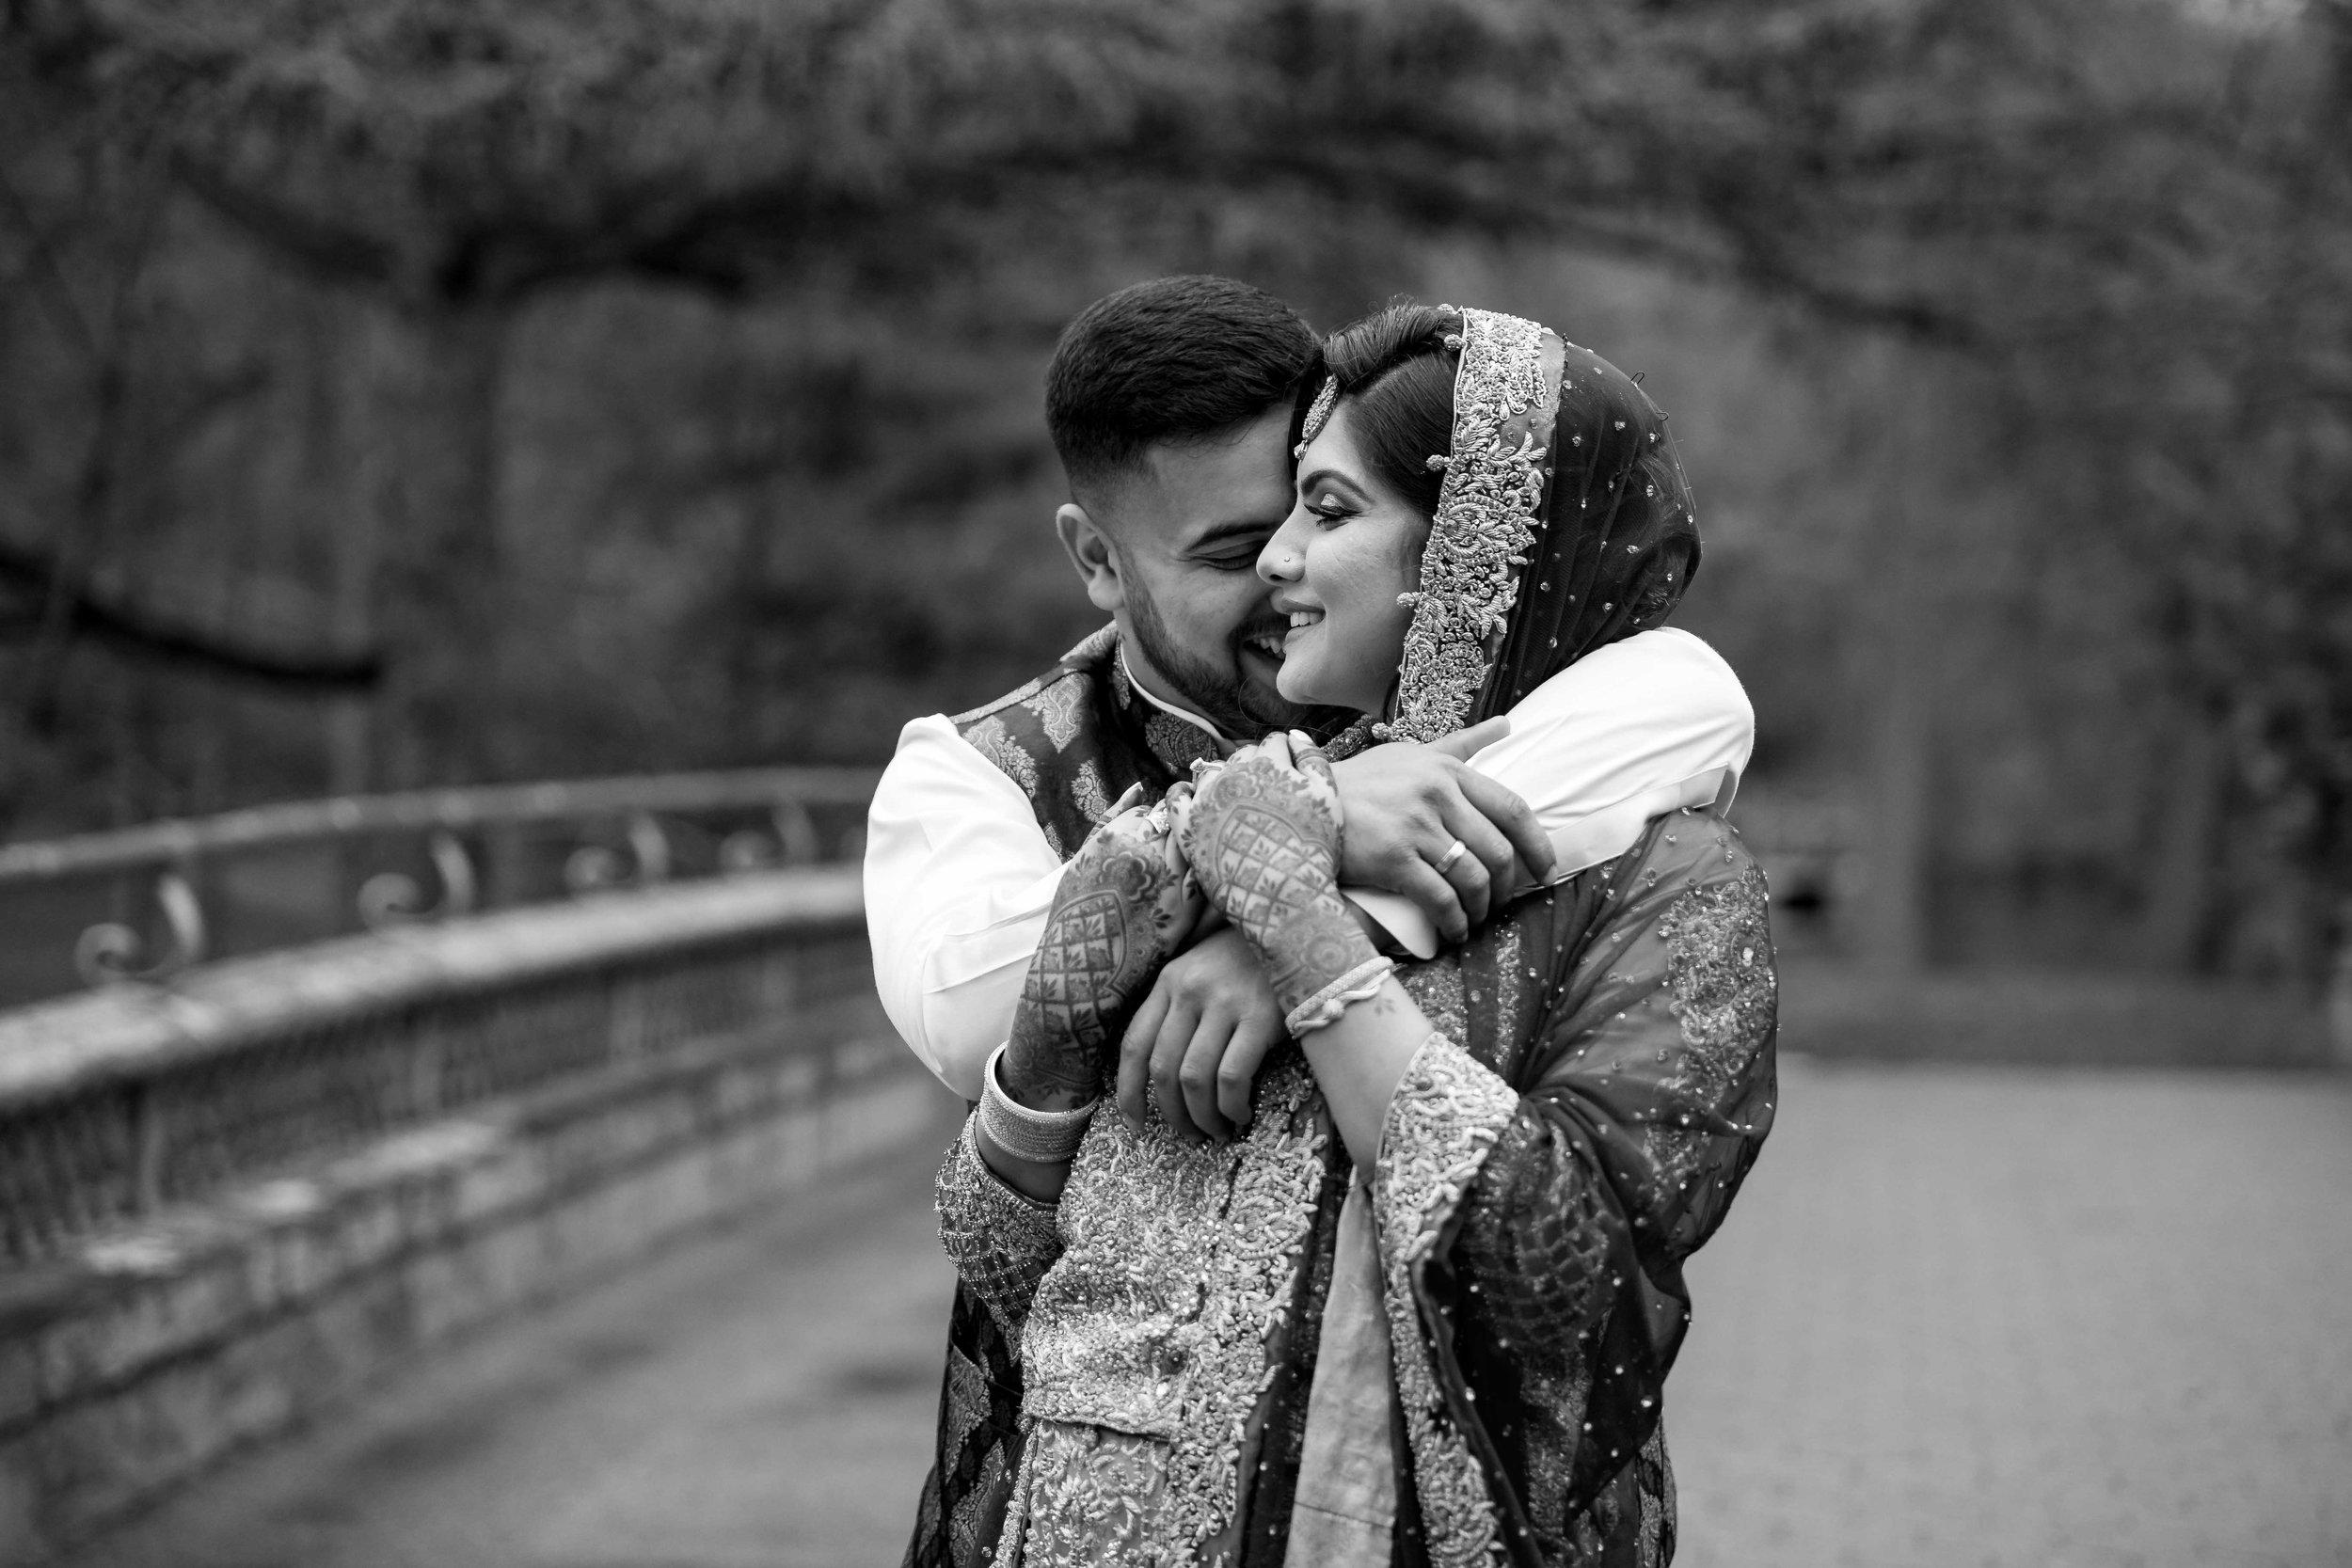 pakistani-wedding-photographer-brooklyn-new-york-49.jpg